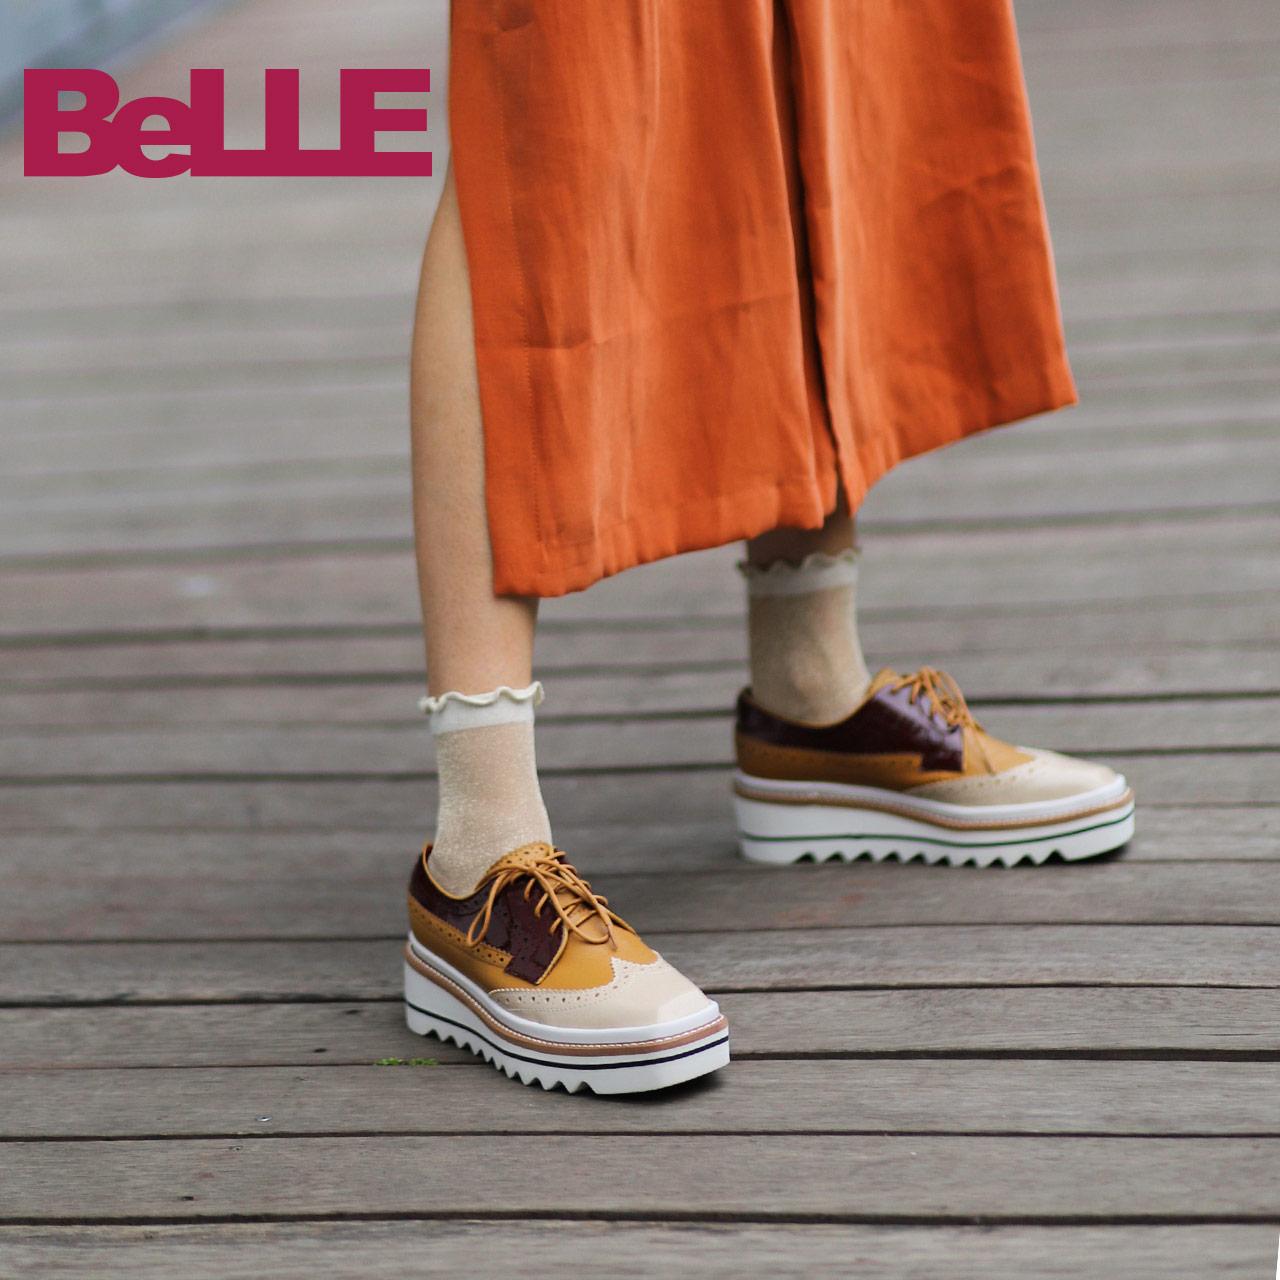 Belle-百丽女鞋松糕鞋2018秋商场同款雕花休闲单鞋T1Z1DCM8